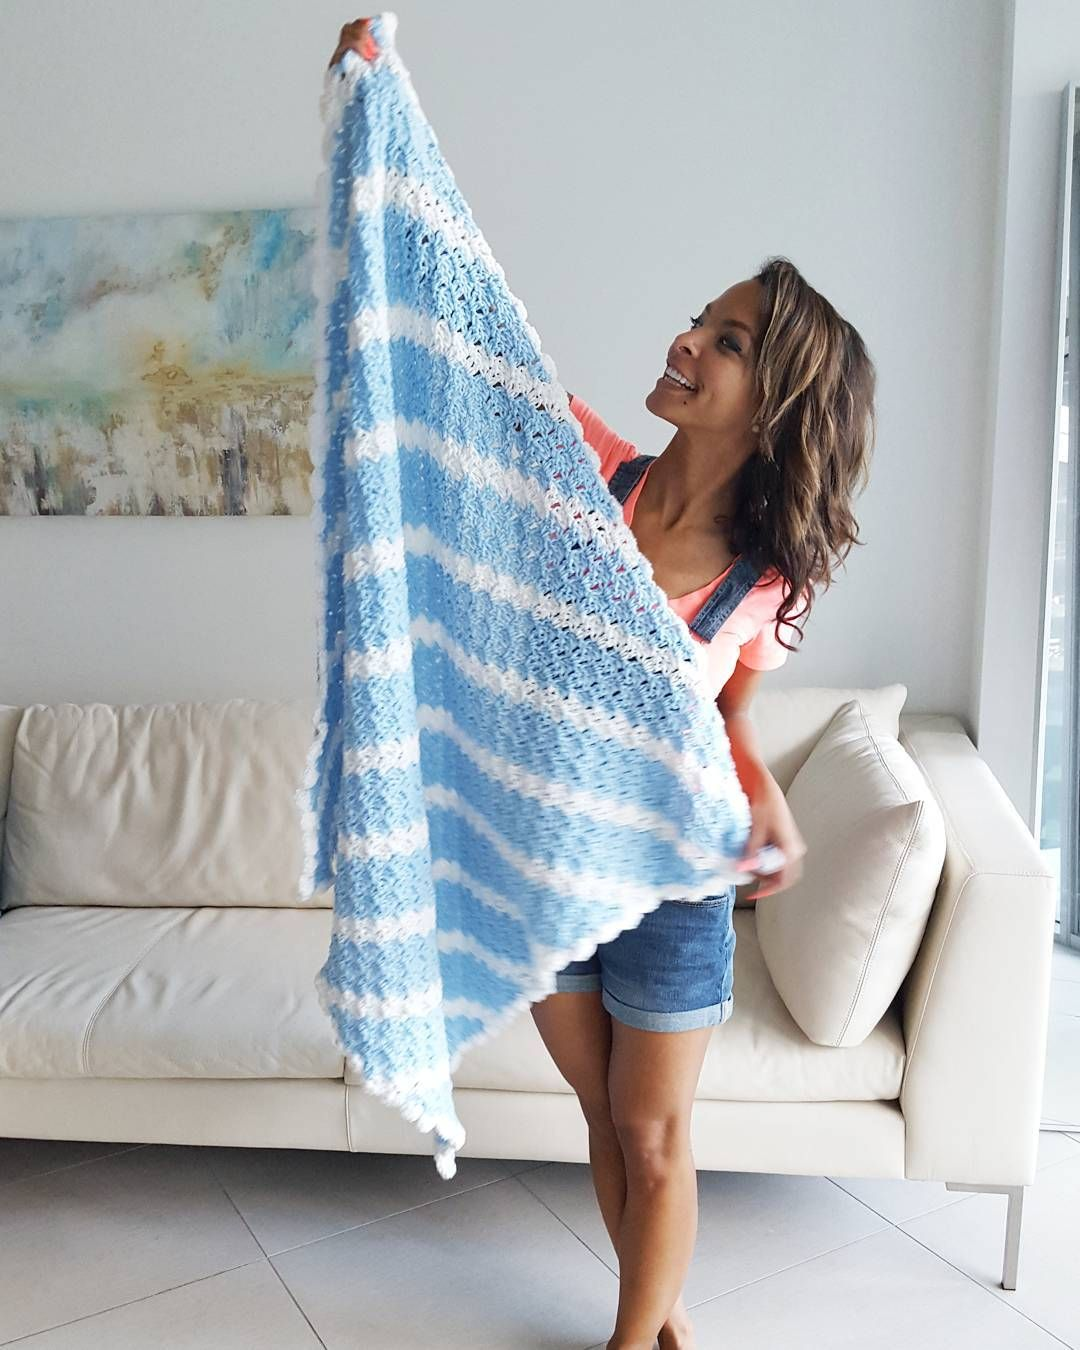 #CrochetBlanket  #happyhooker #yarnsohard #crochetaddict #crochettherapy by craftyconstance